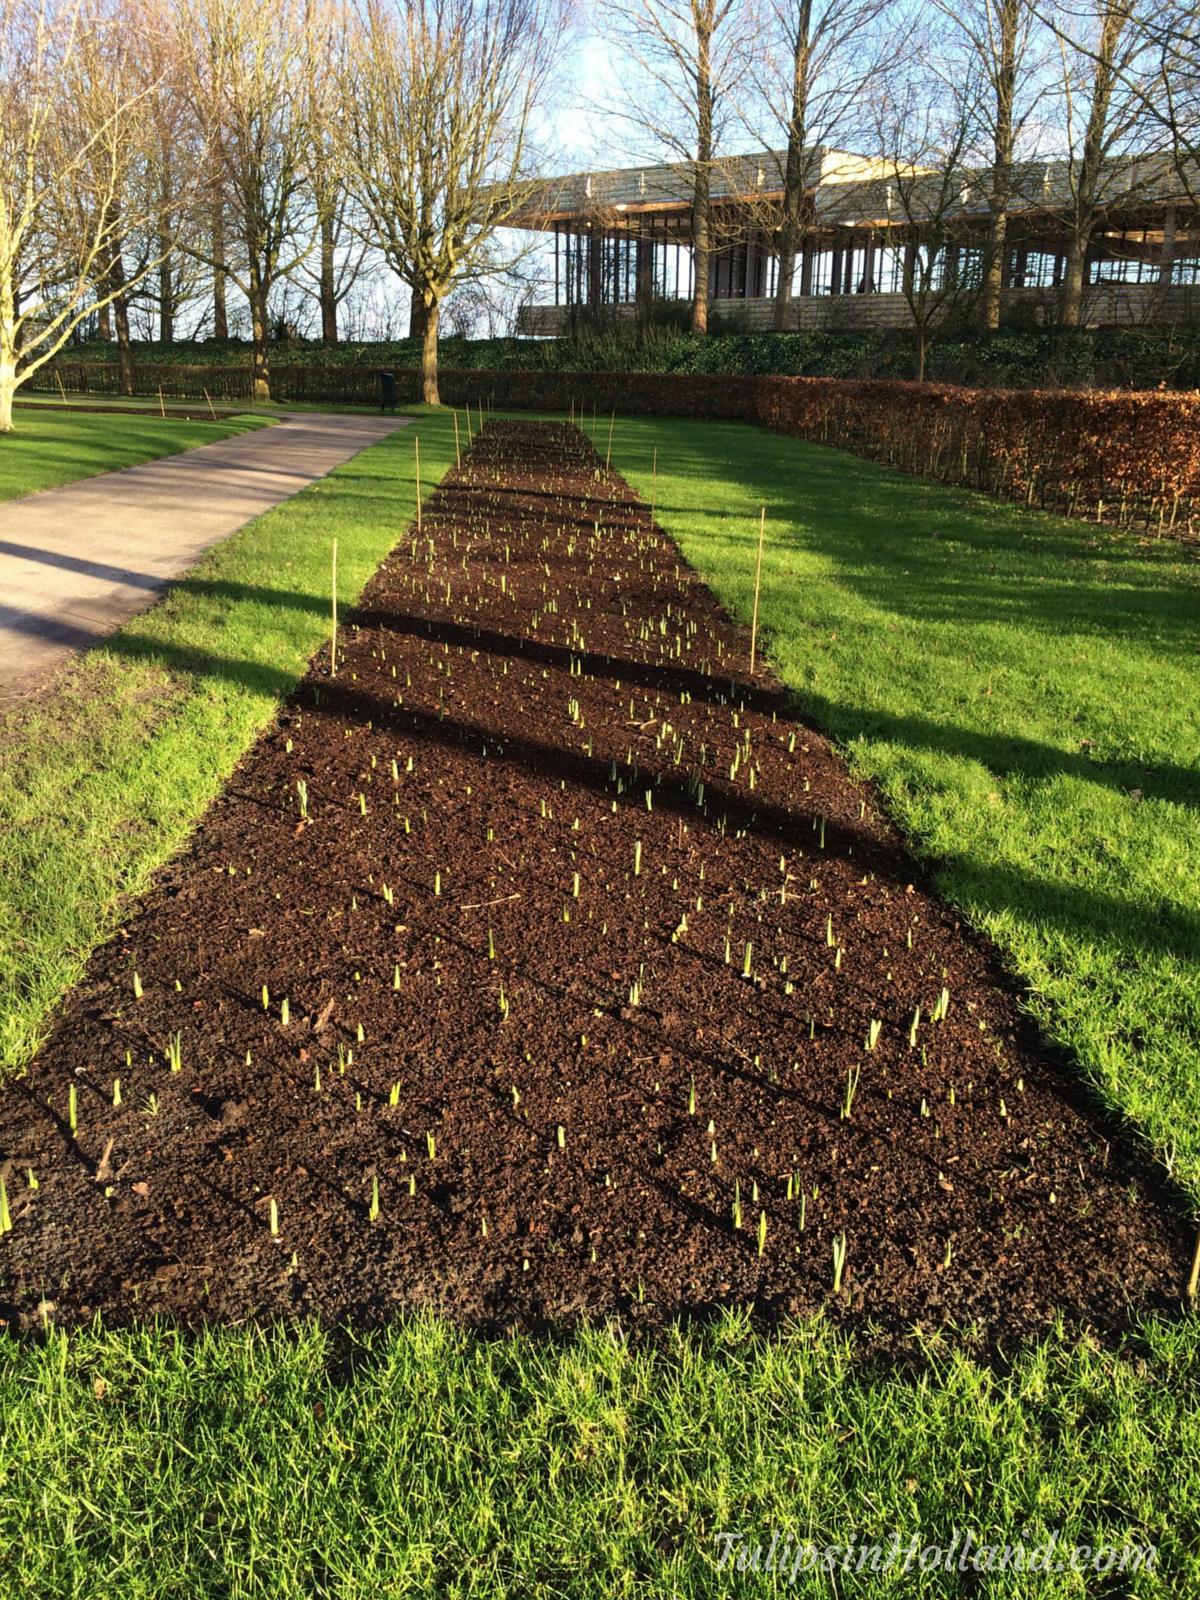 New Entrance Keukenhof 2017 - Tulips in Holland